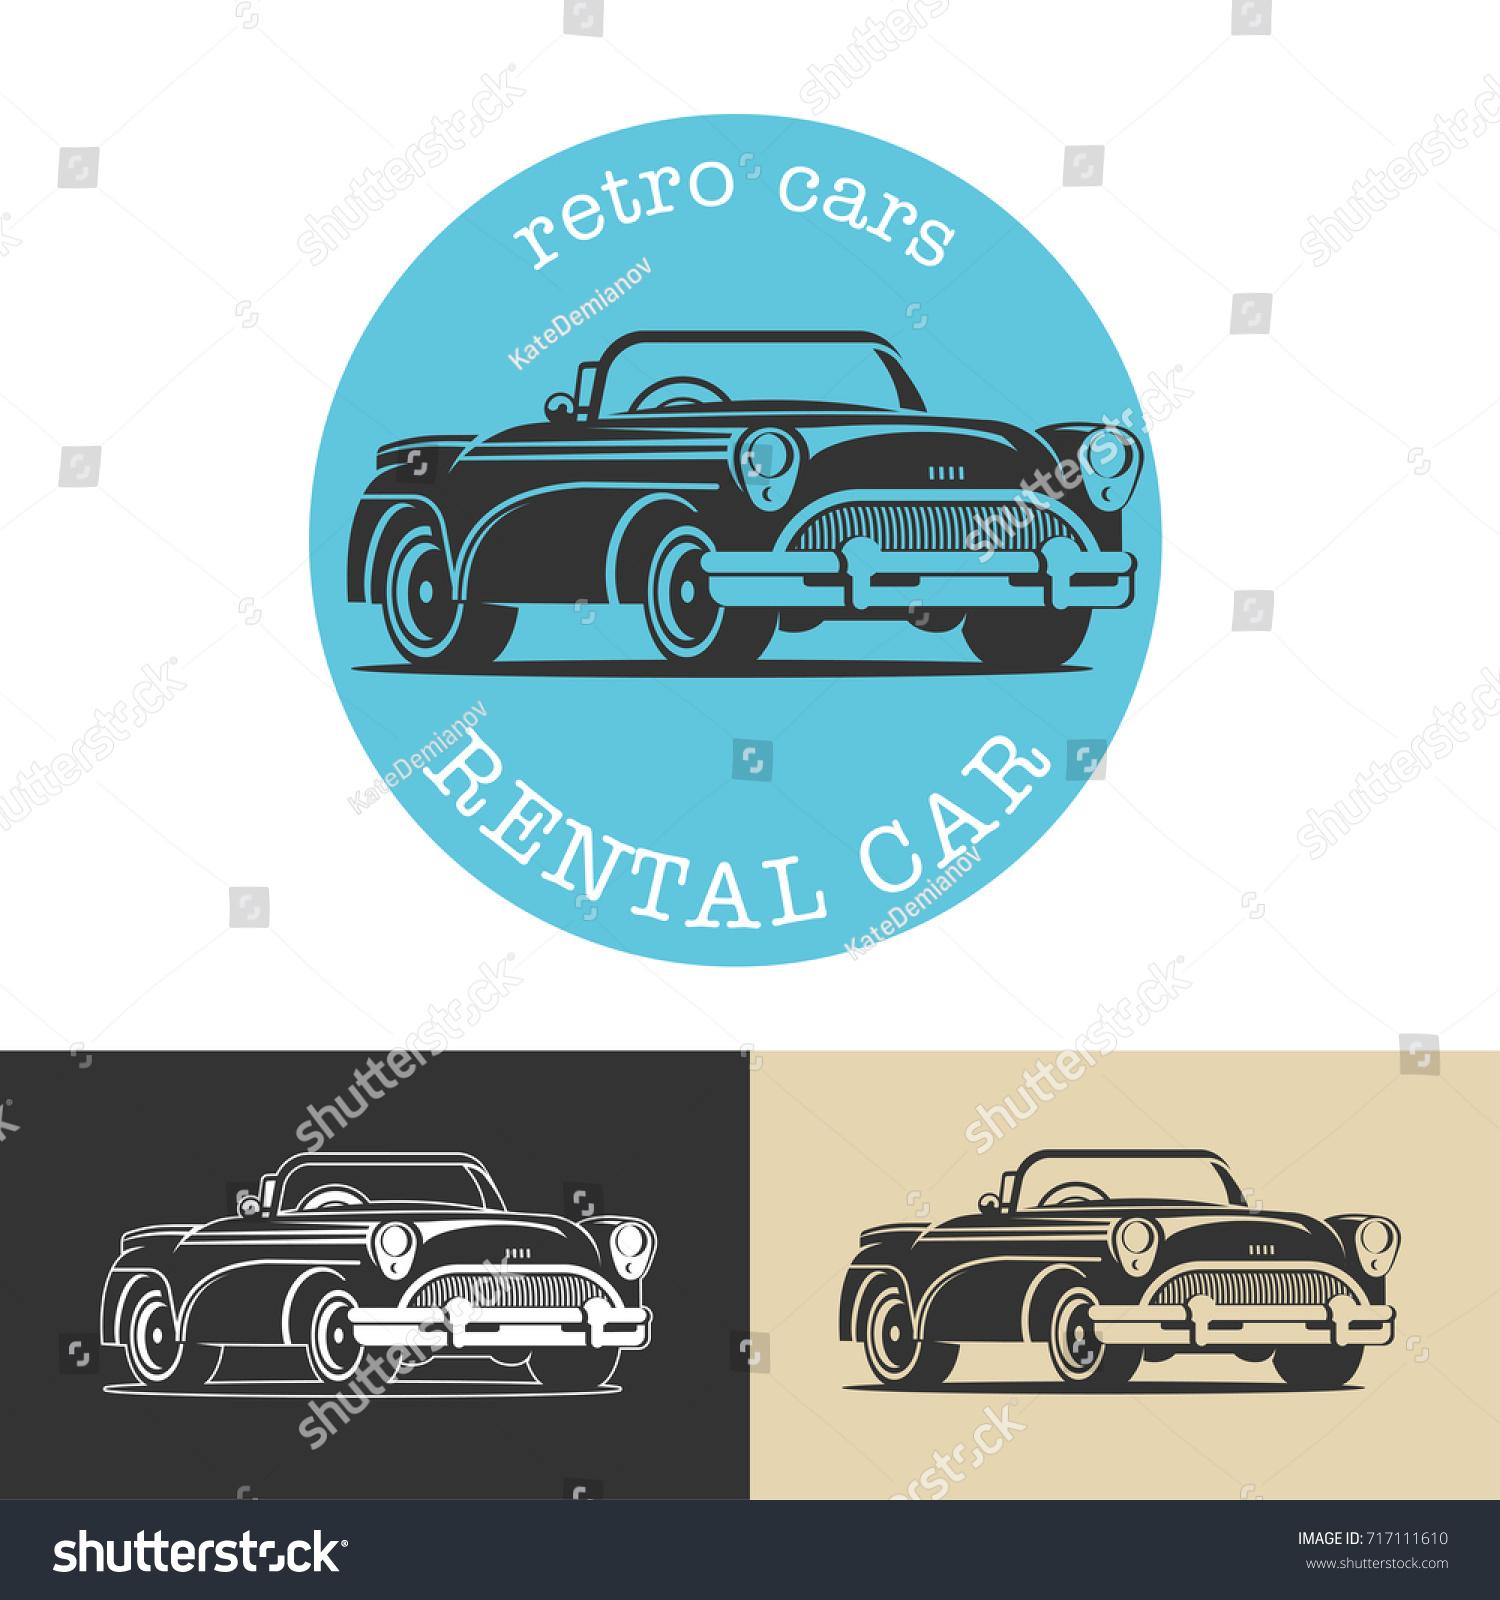 Vintage Car Black Vector Sign Logo Stock Vector 717111610 - Shutterstock